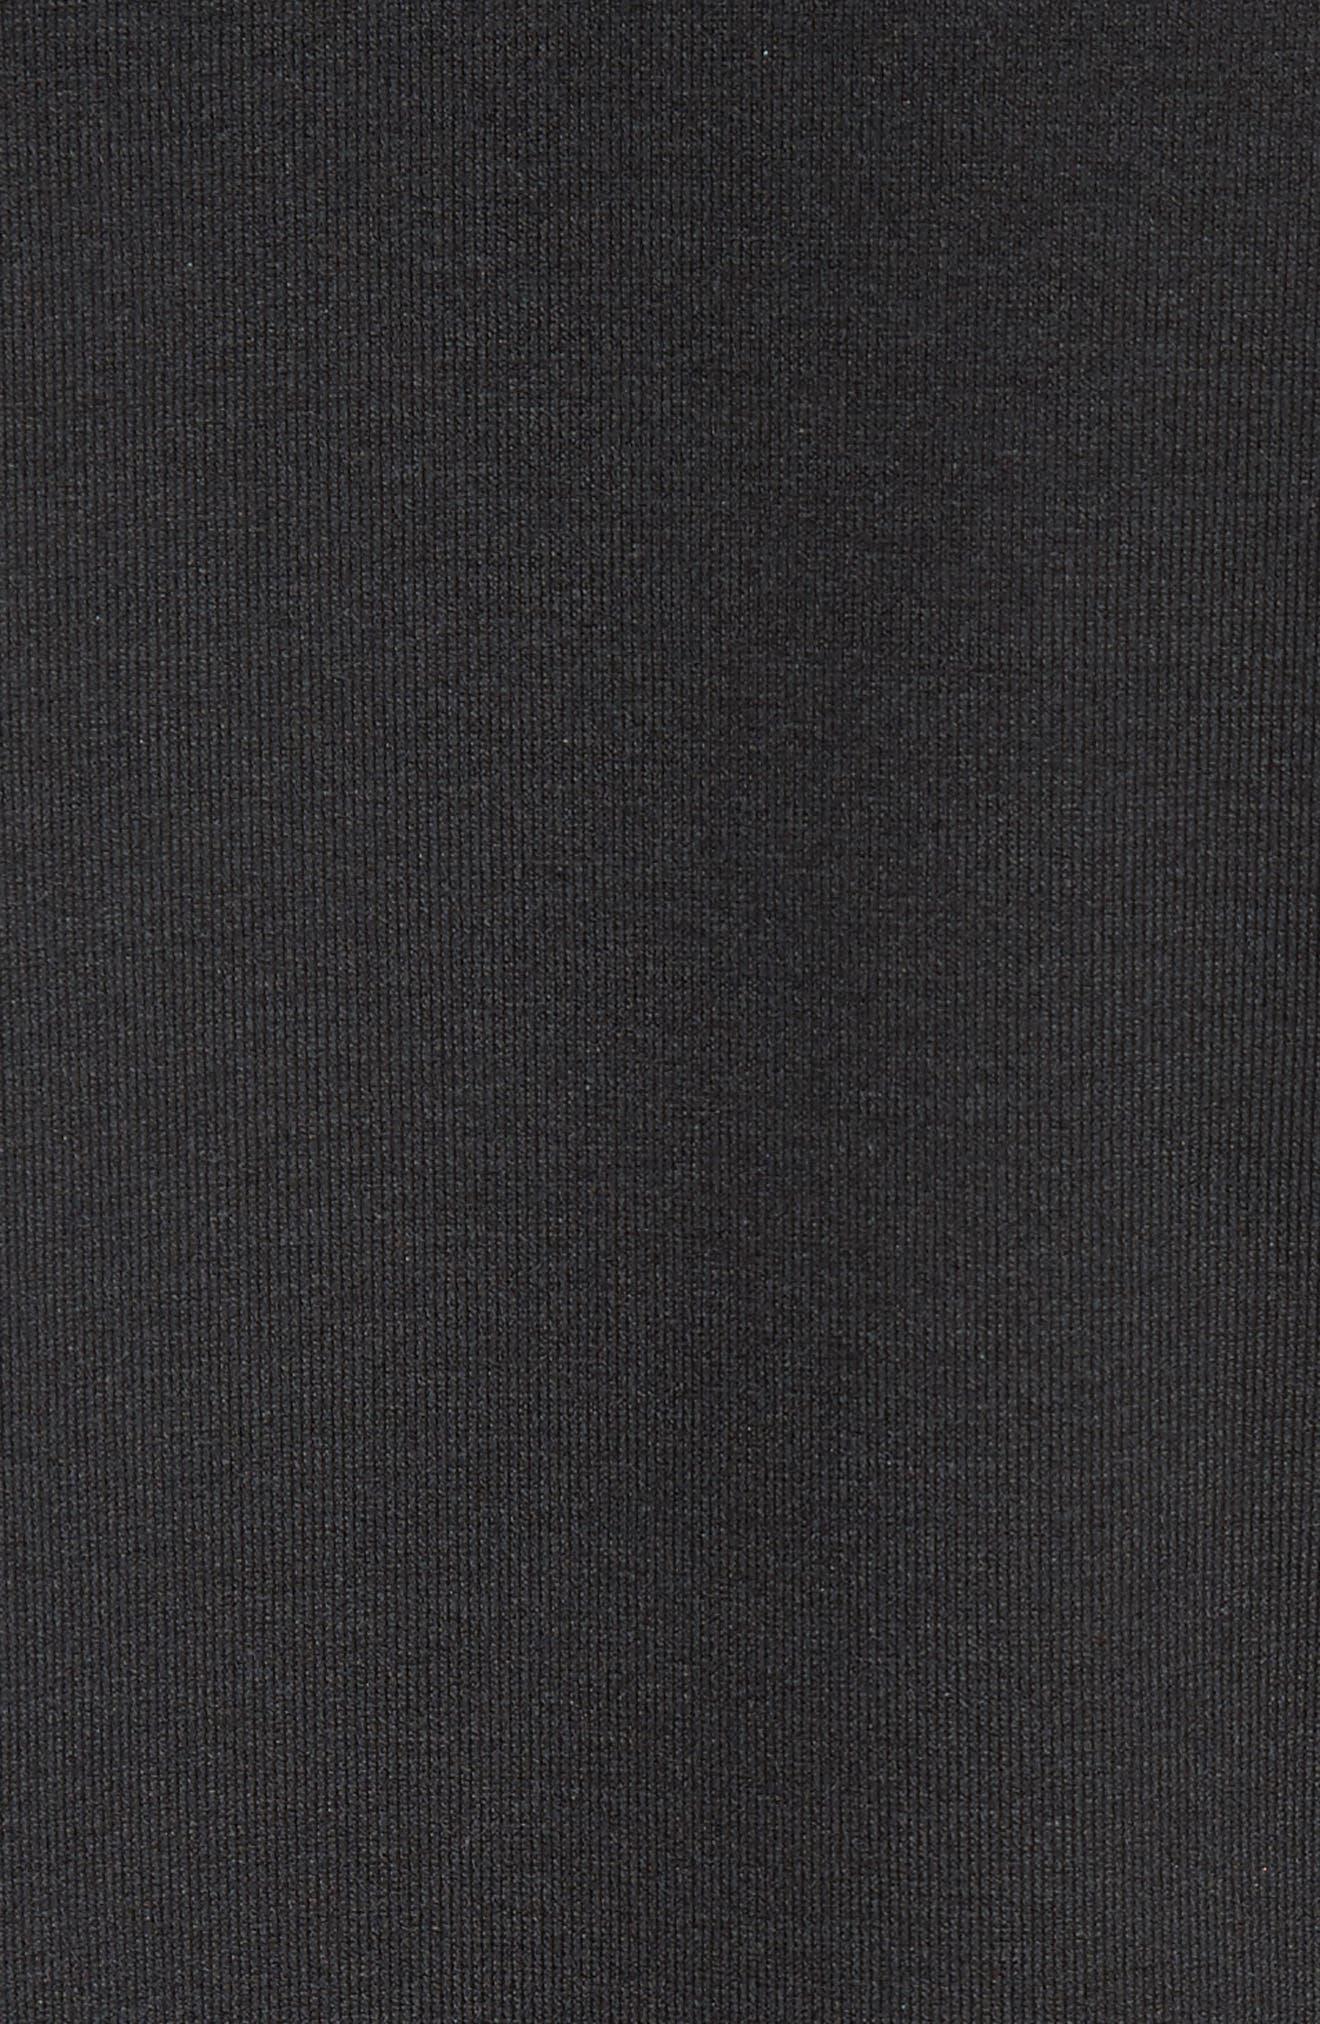 Scoop Neck Cotton Tee,                             Alternate thumbnail 6, color,                             BLACK